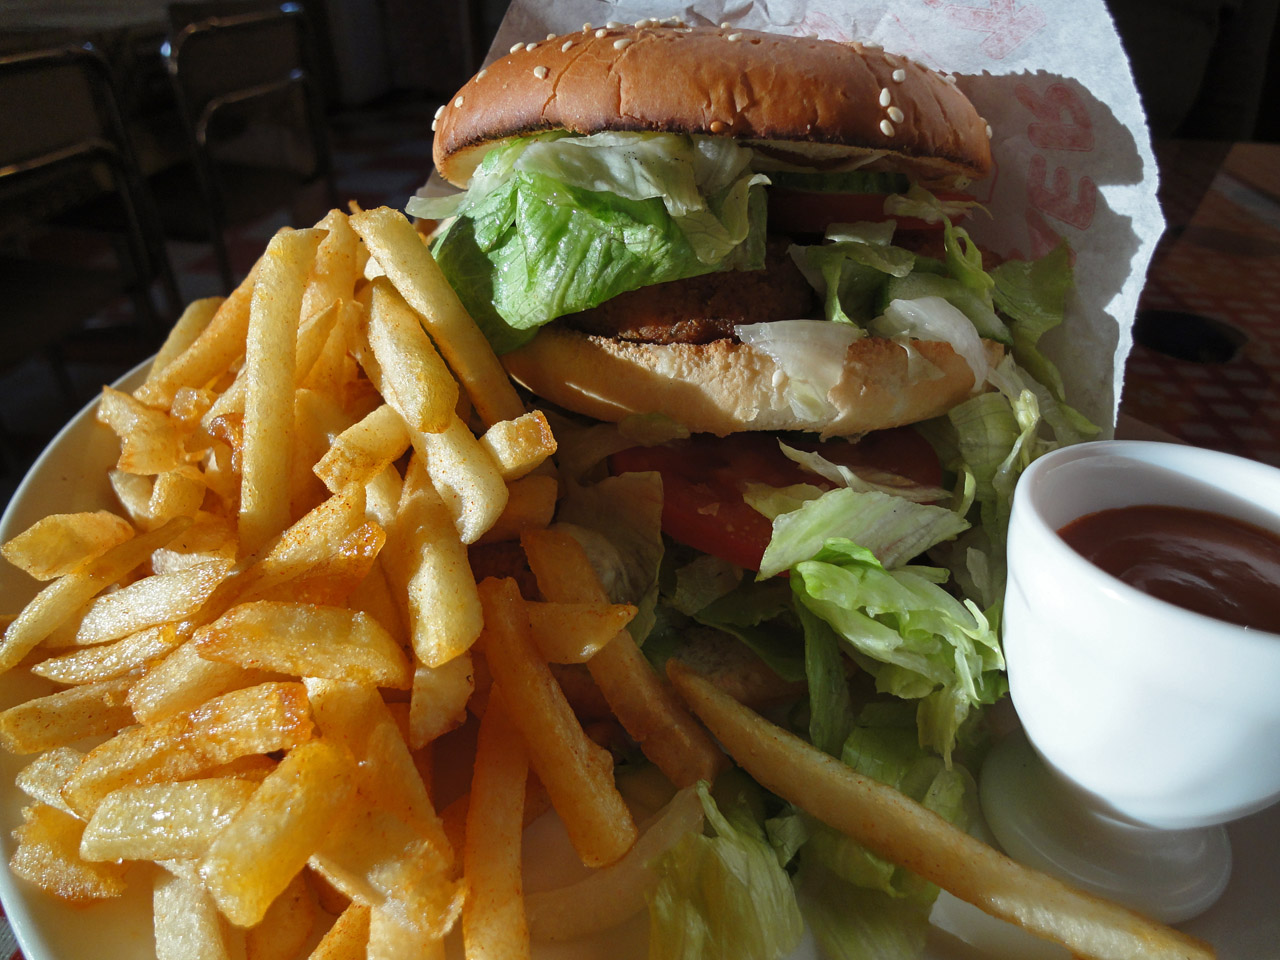 Pizzeria Online, Helsinki: Kasvis hampurilaisateria (falafel)